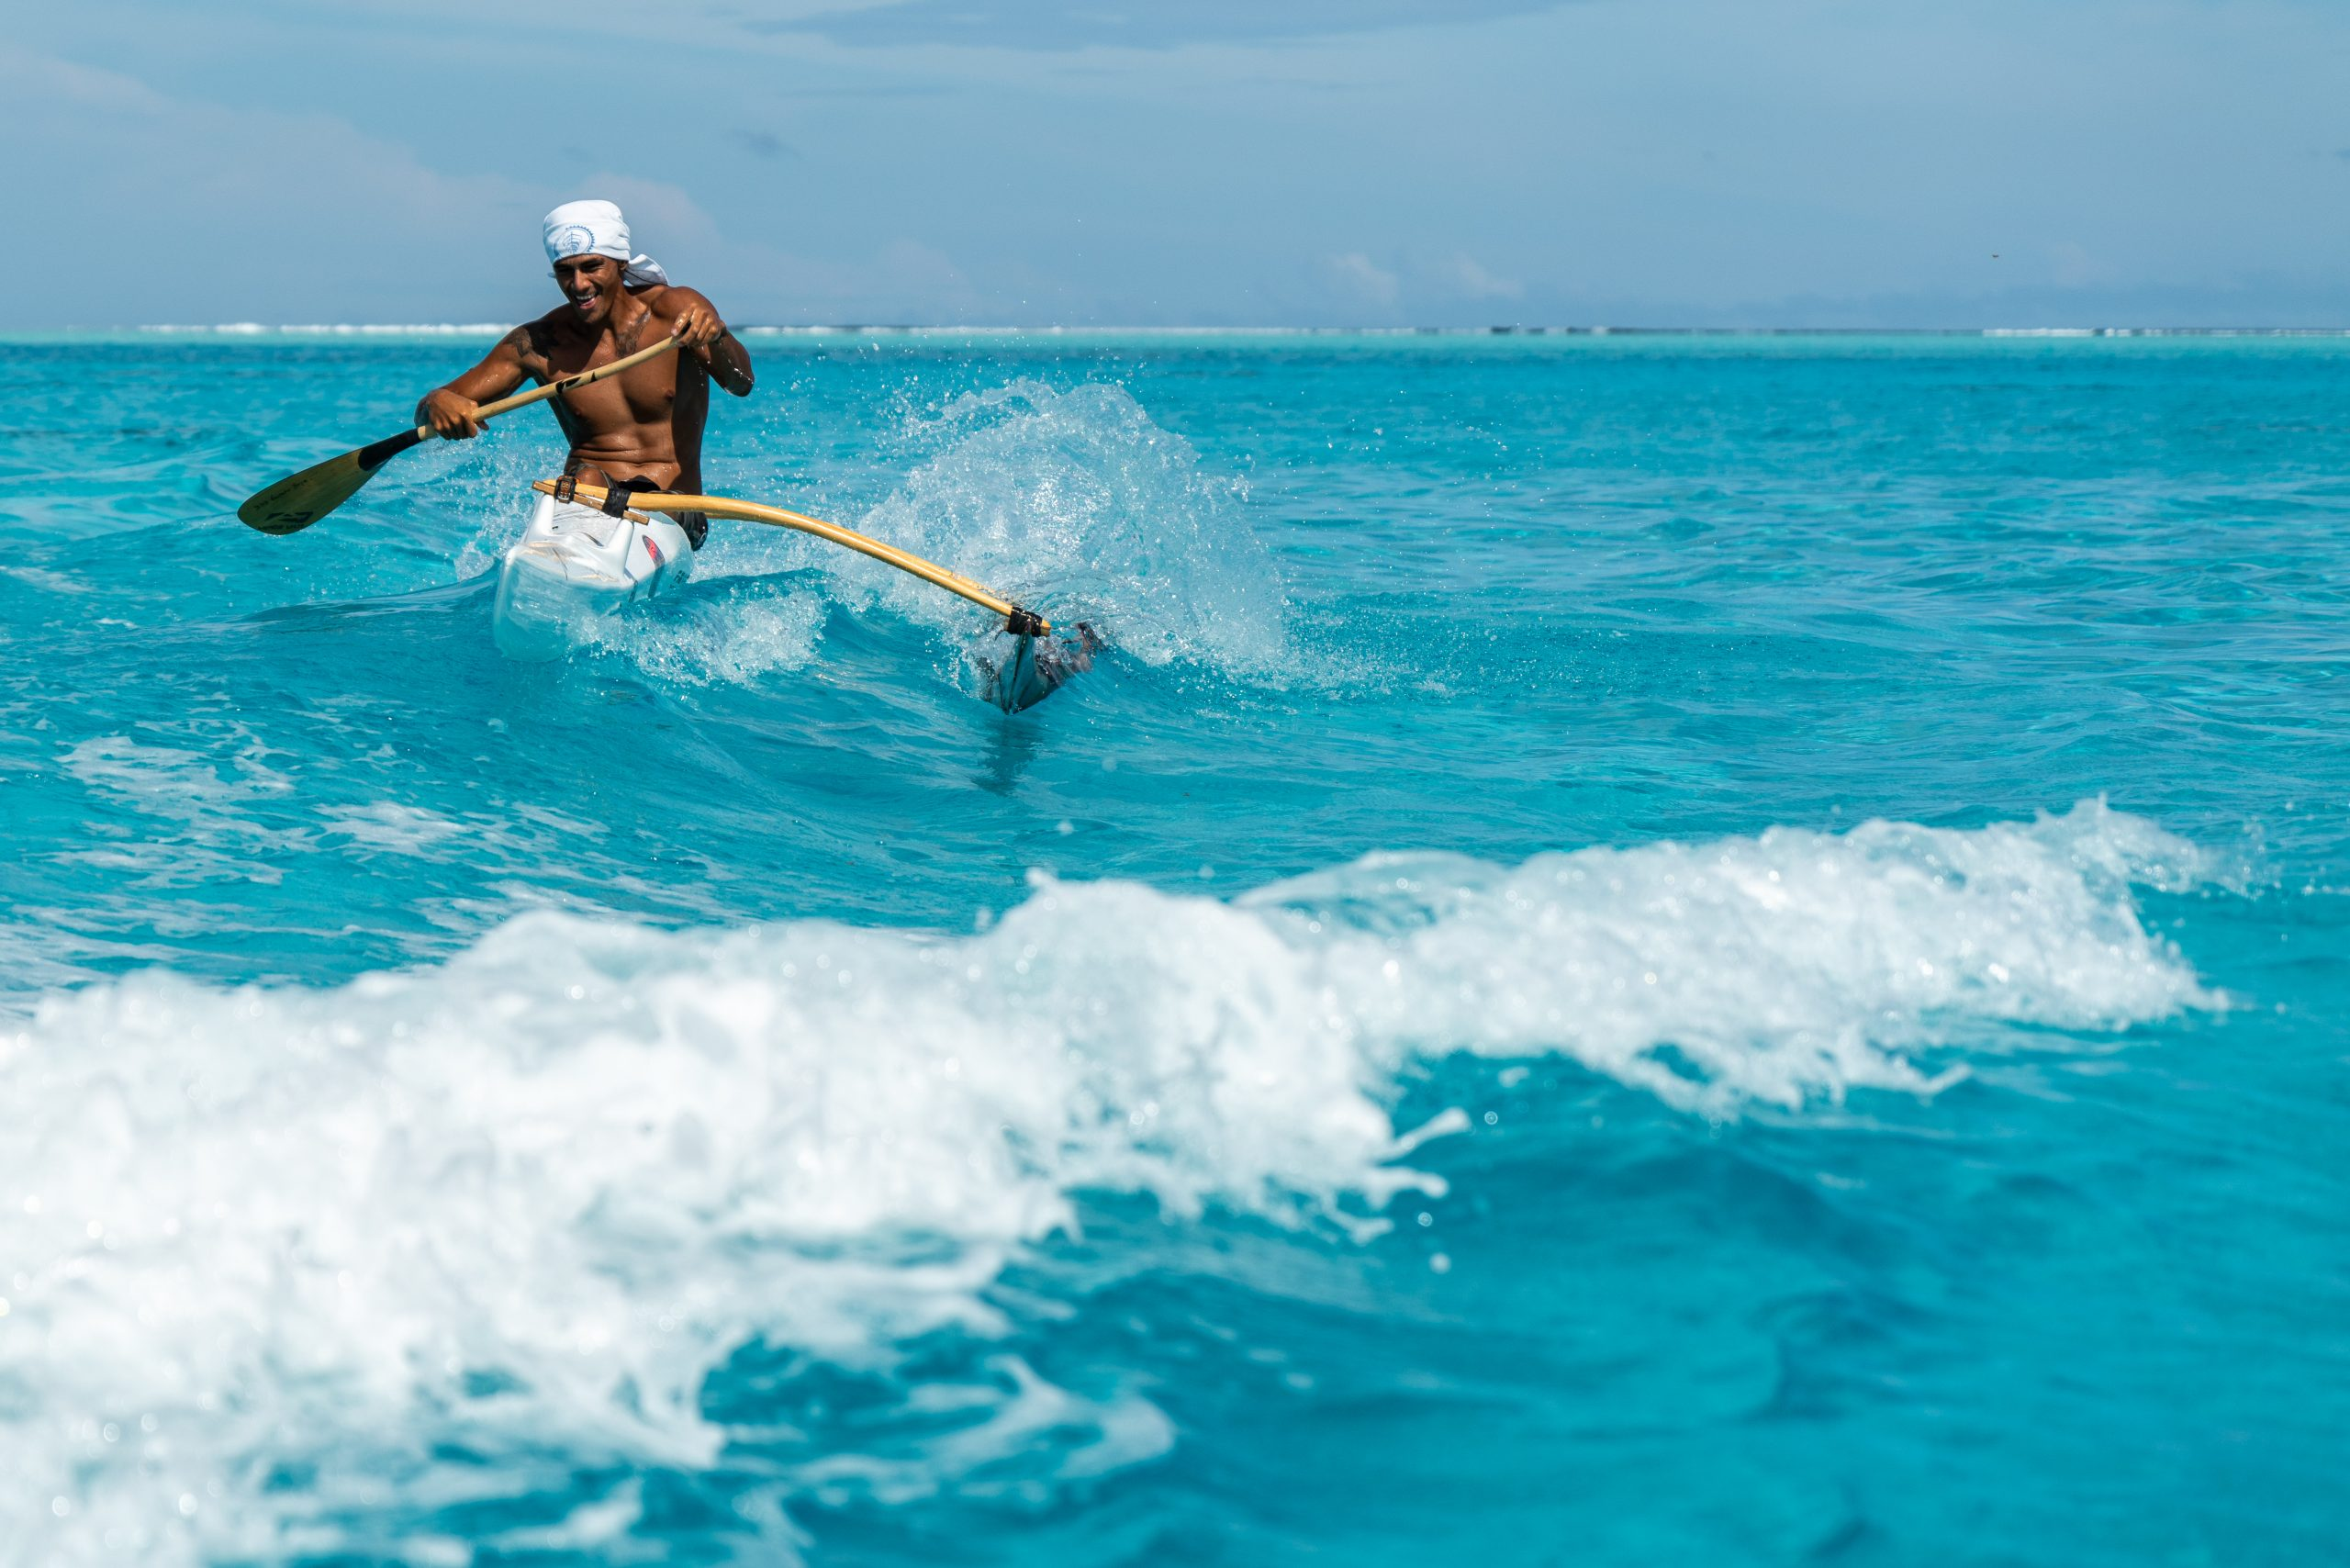 In the Islands of Tahiti